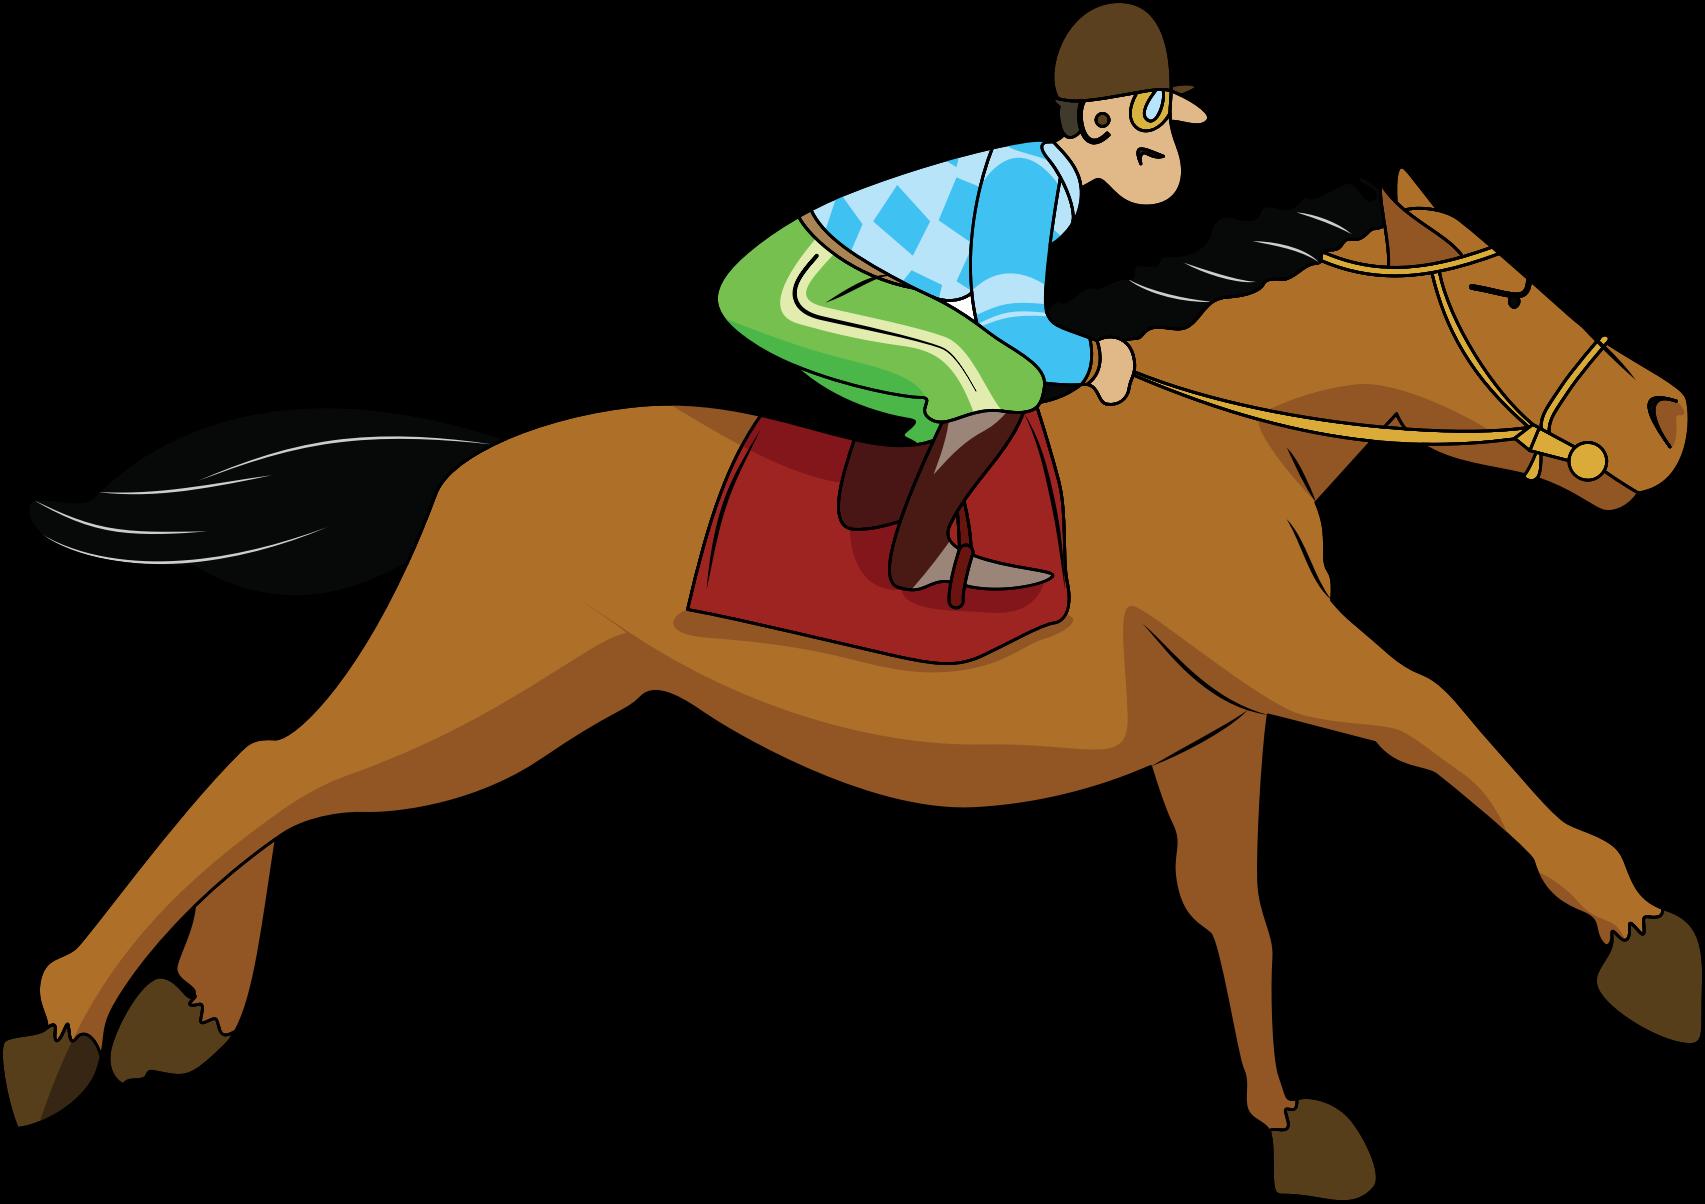 Race Horse Clip Art Clipart Galloping Ho-Race Horse Clip Art Clipart Galloping Horse-15